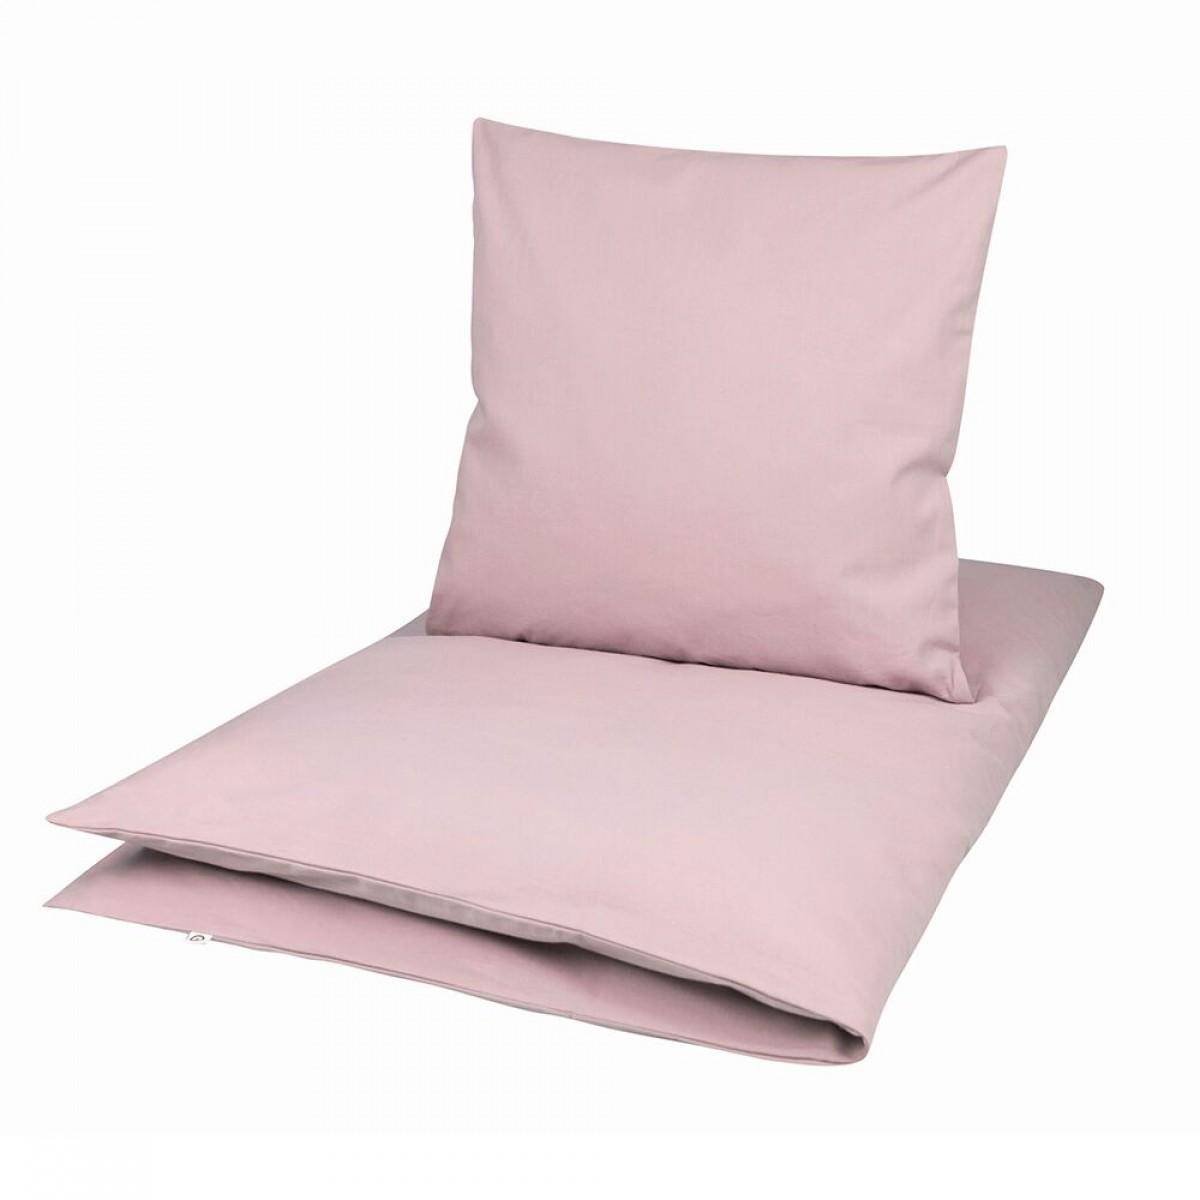 Mãœsli – Müsli juniorsengetøj - rosa, 2 stk. på lager fra pixizoo